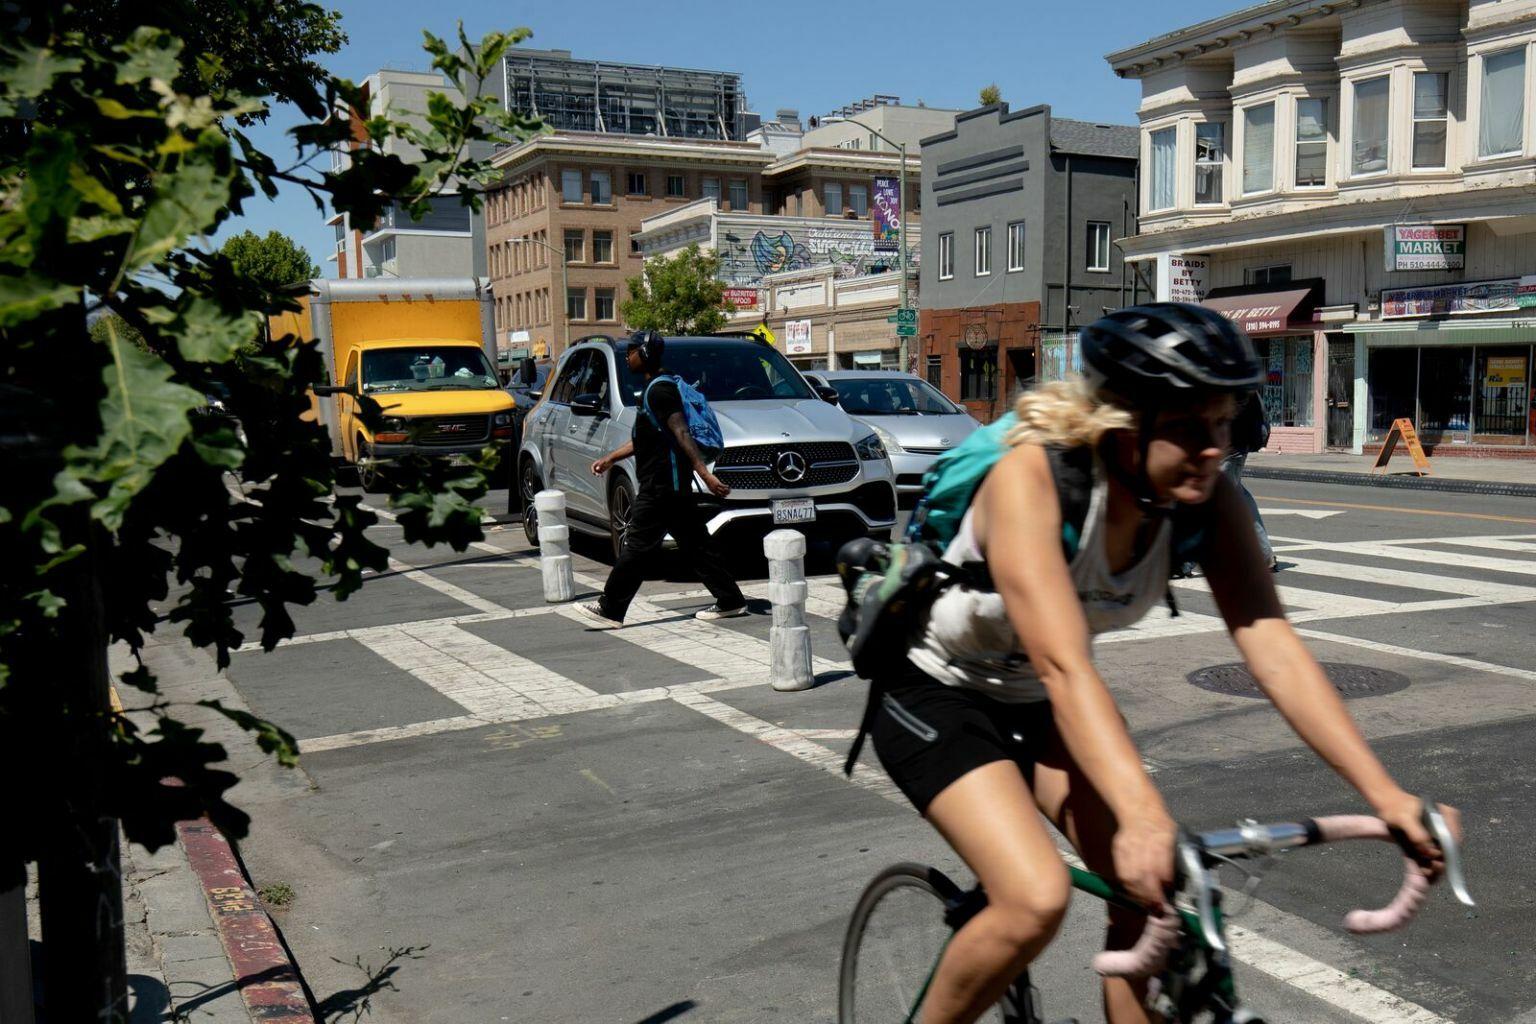 bike lanes protected